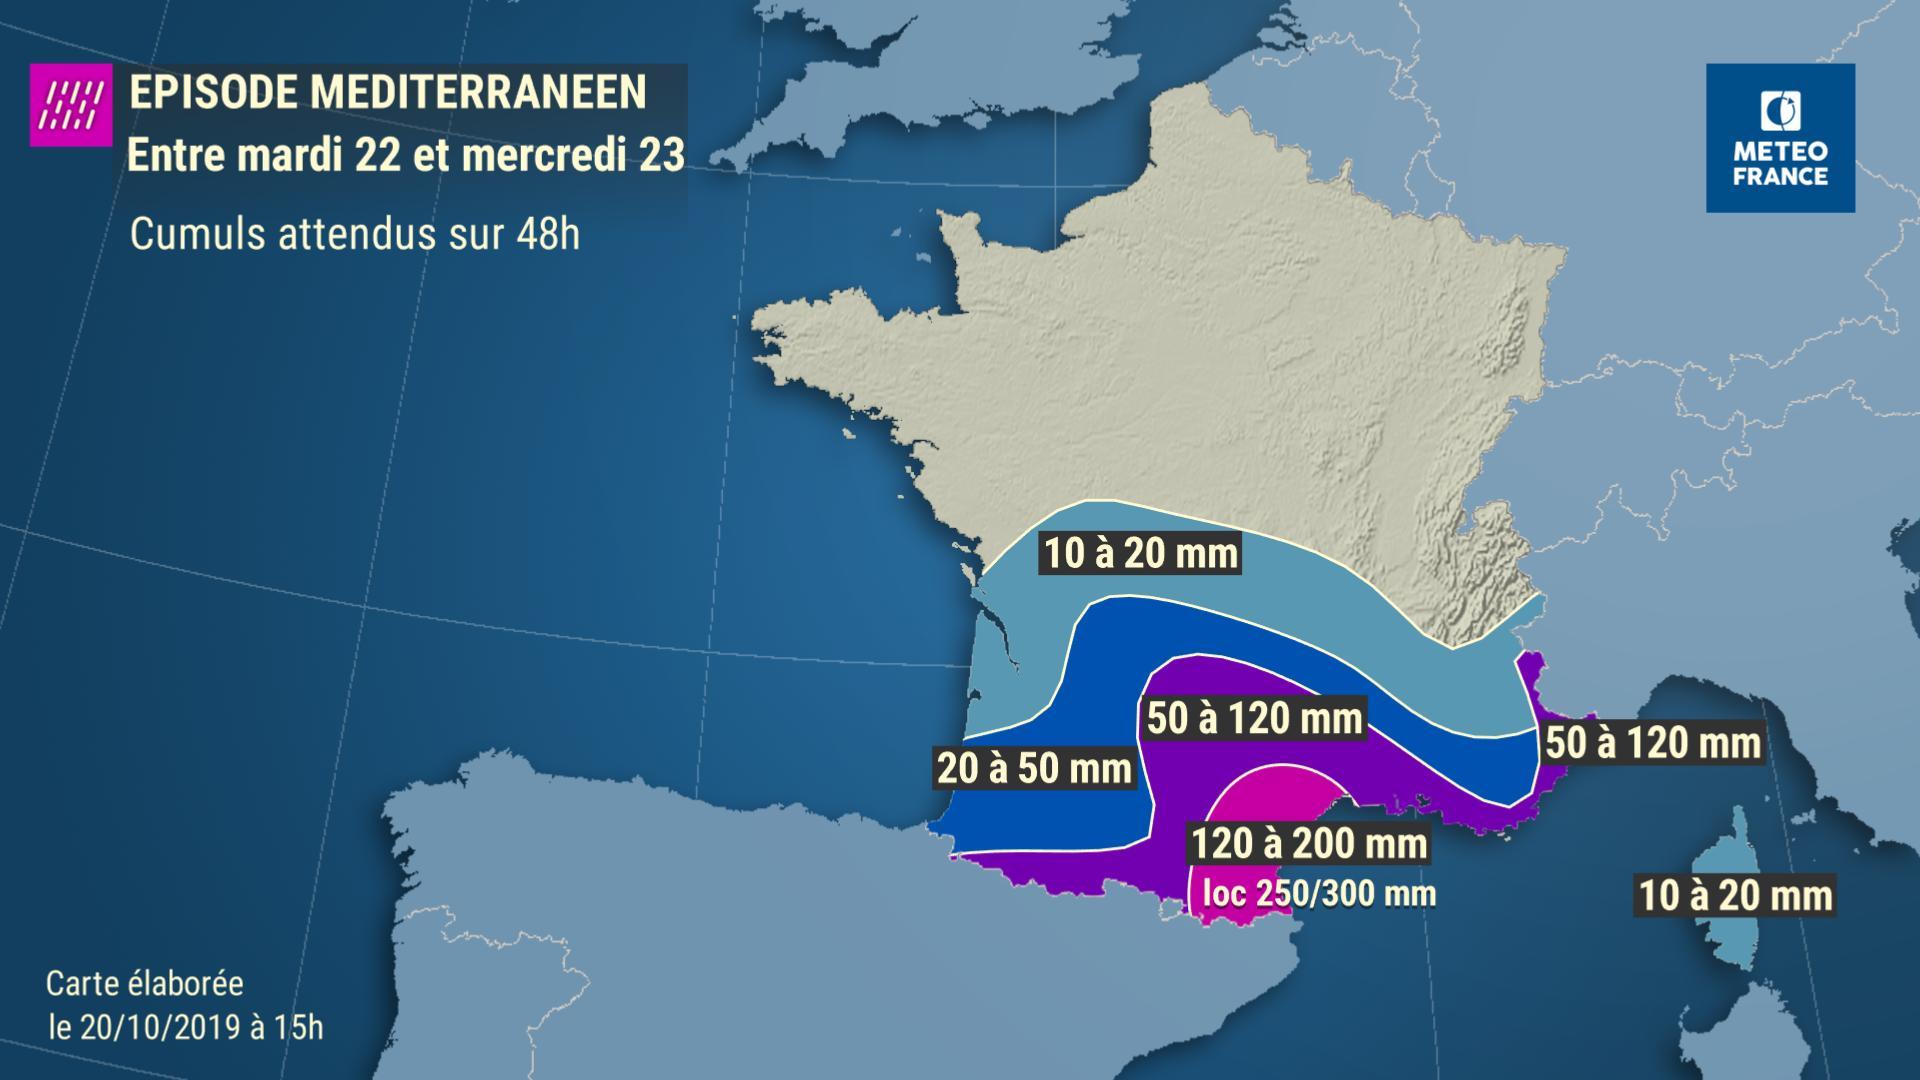 Episode méditerranéen